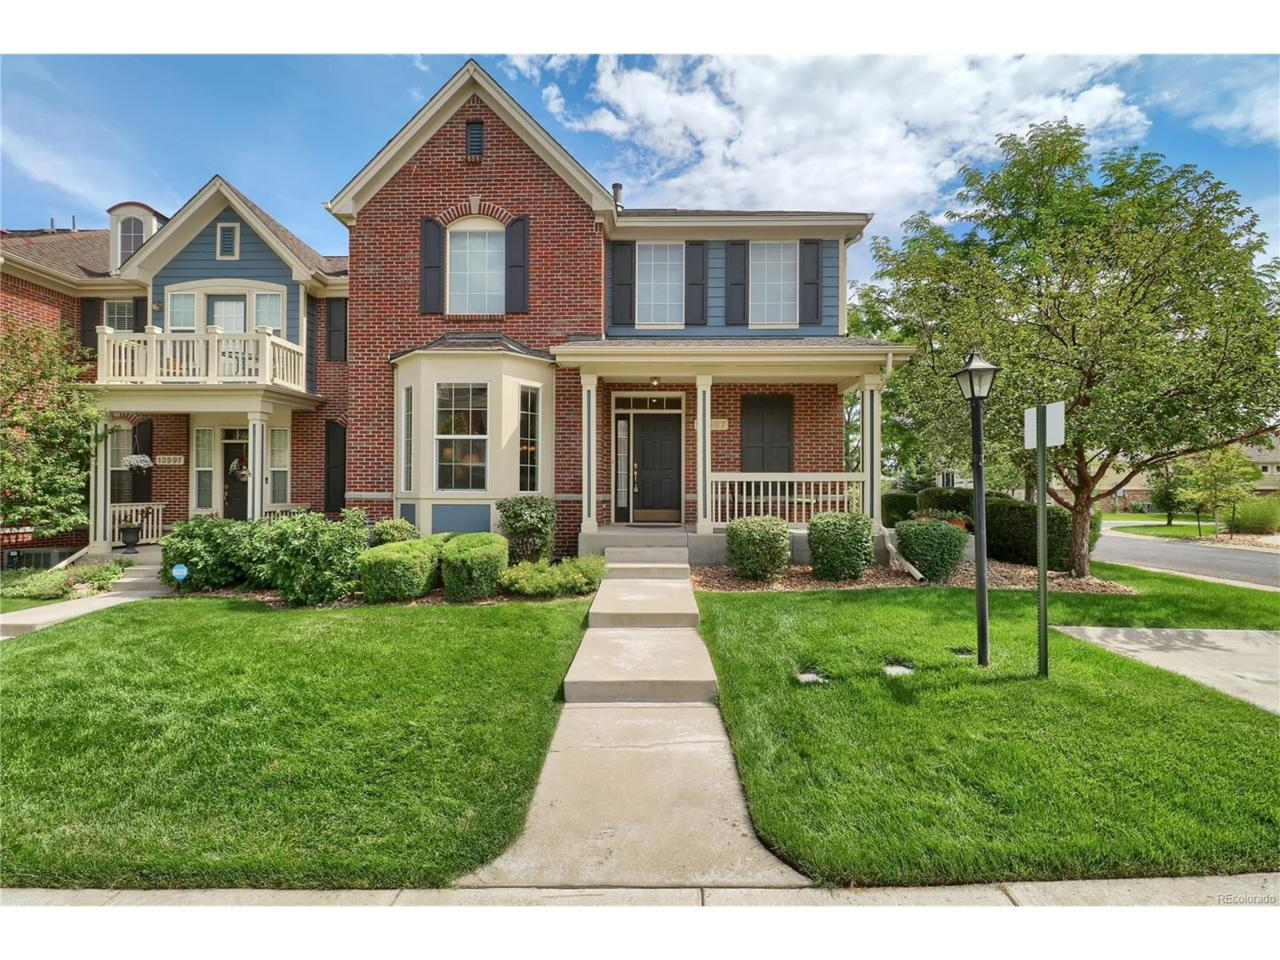 13987 W 84th Circle, Arvada, CO 80005 (MLS #8795180) :: 8z Real Estate